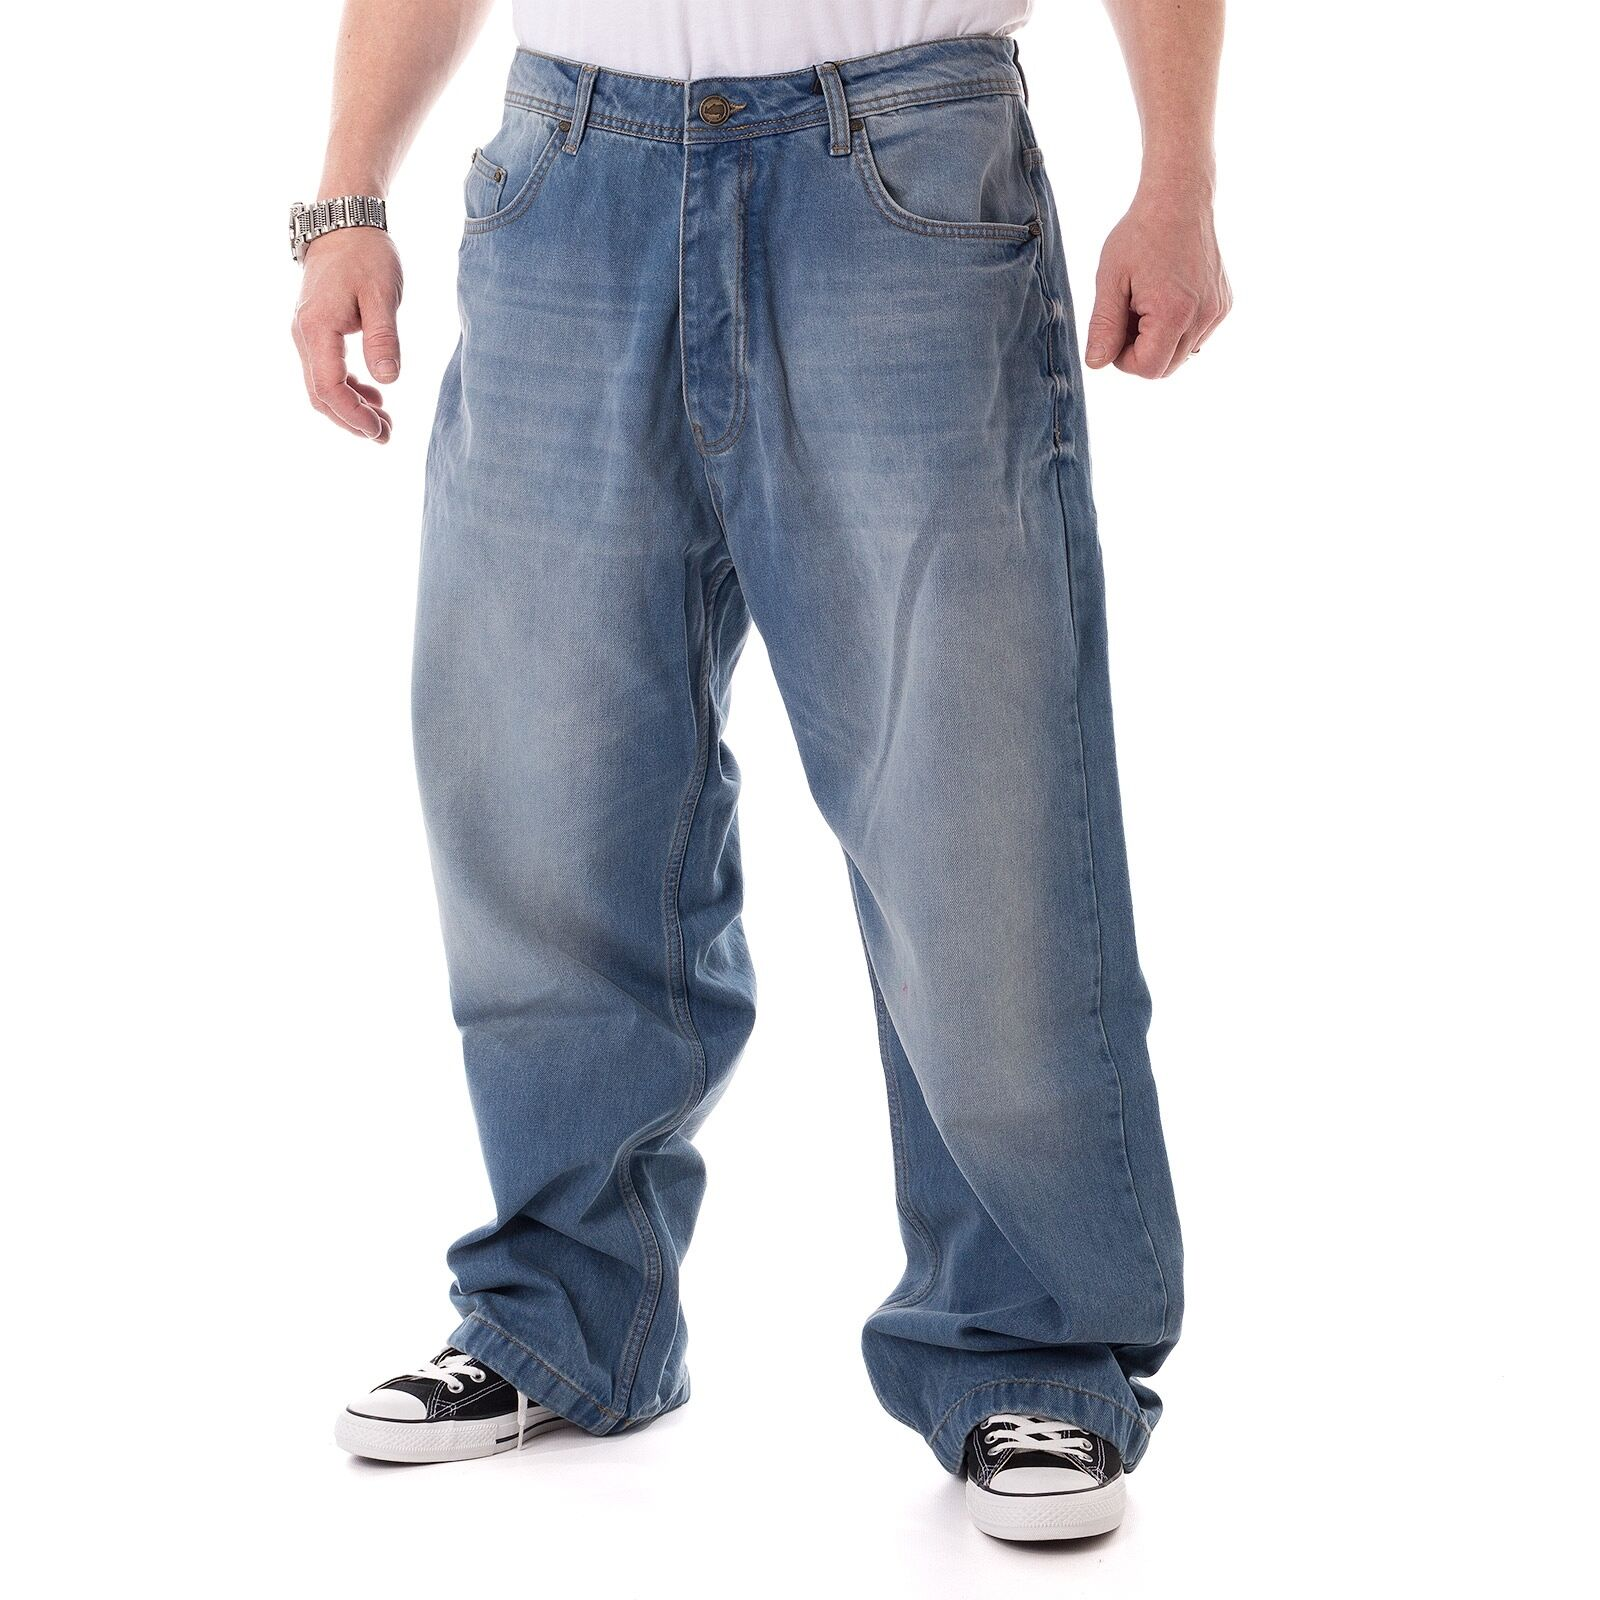 ECKO unltd. FAT BRO BAGGY blu luminoso Jeans Uomo, blu blu blu luminoso, 15509 47690f